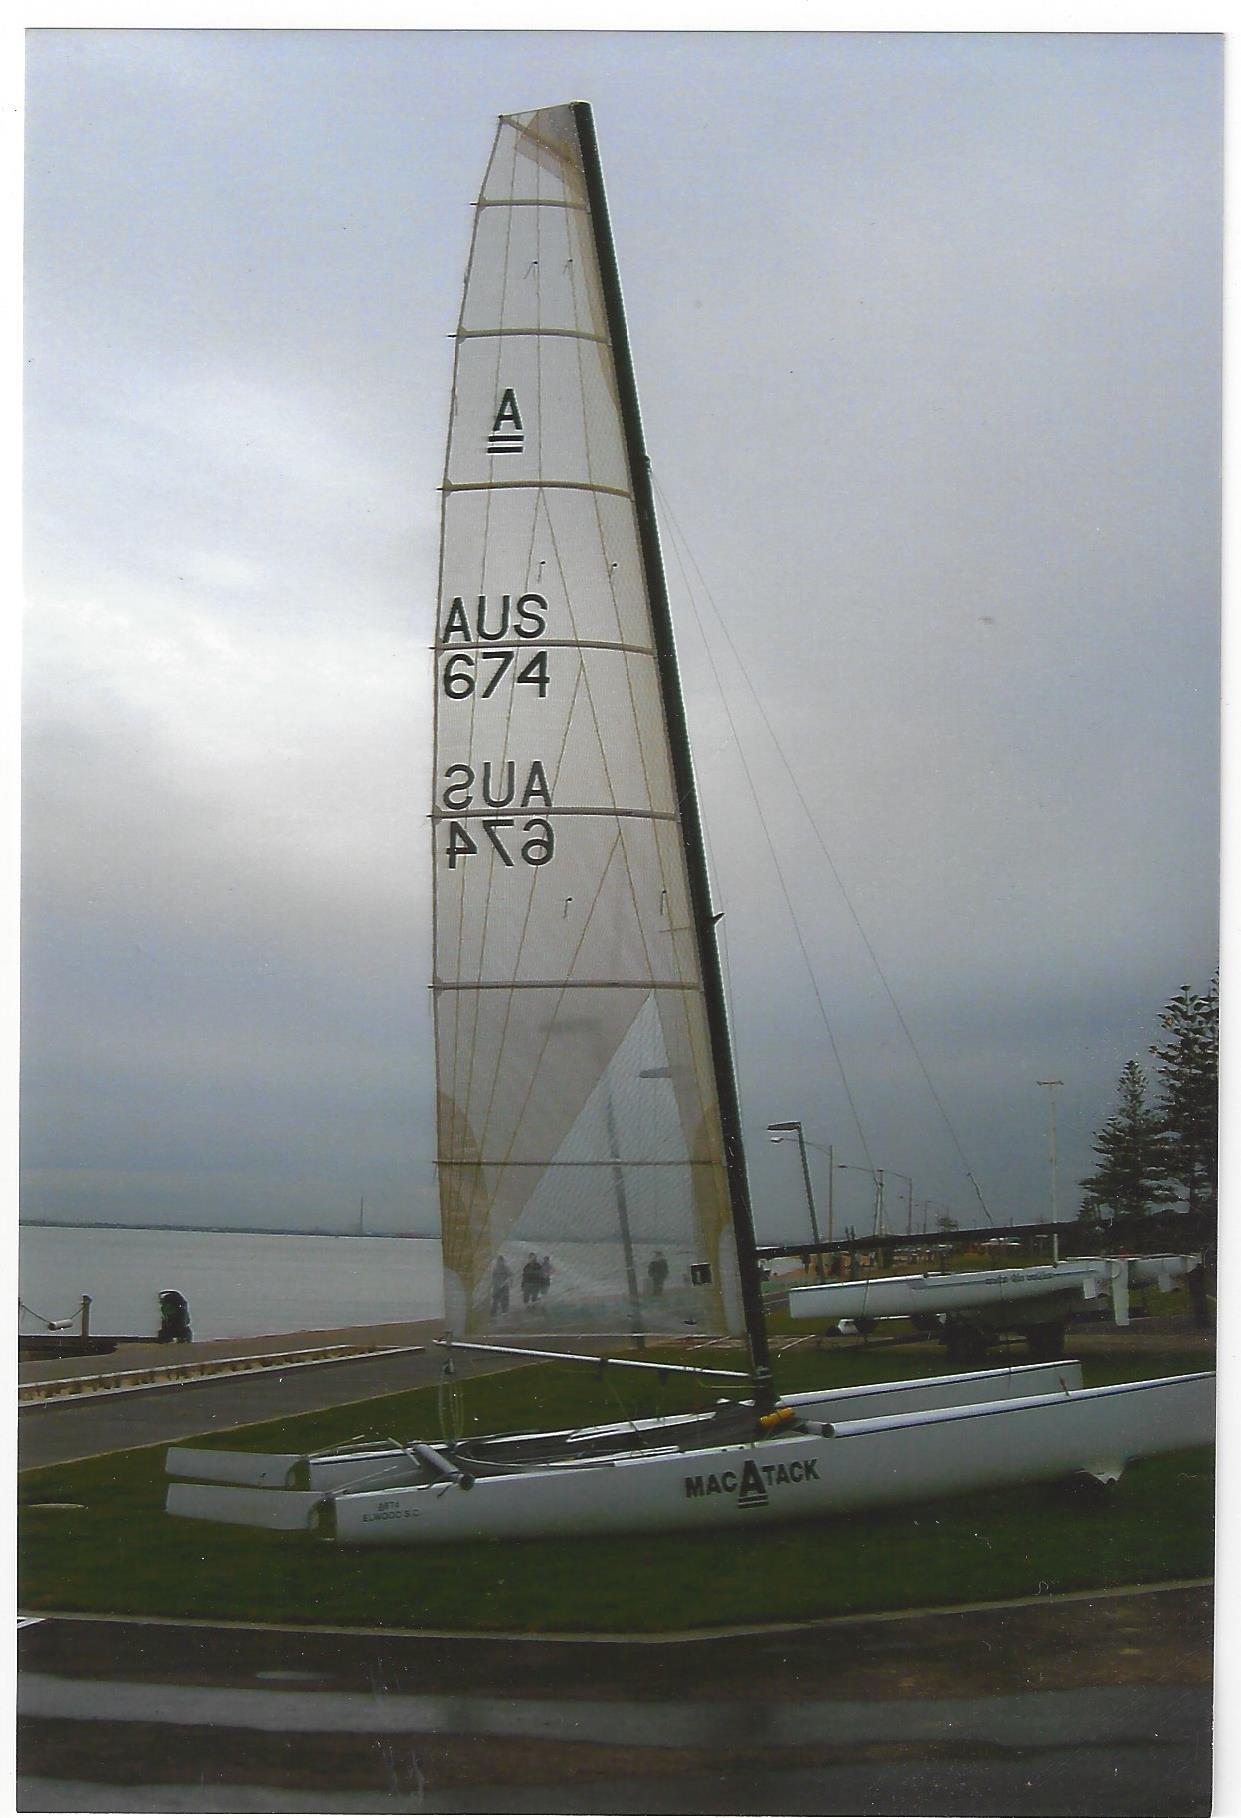 Temp Cover Insurance >> A Class catamaran for sale - Elwood Sailing ClubElwood Sailing Club